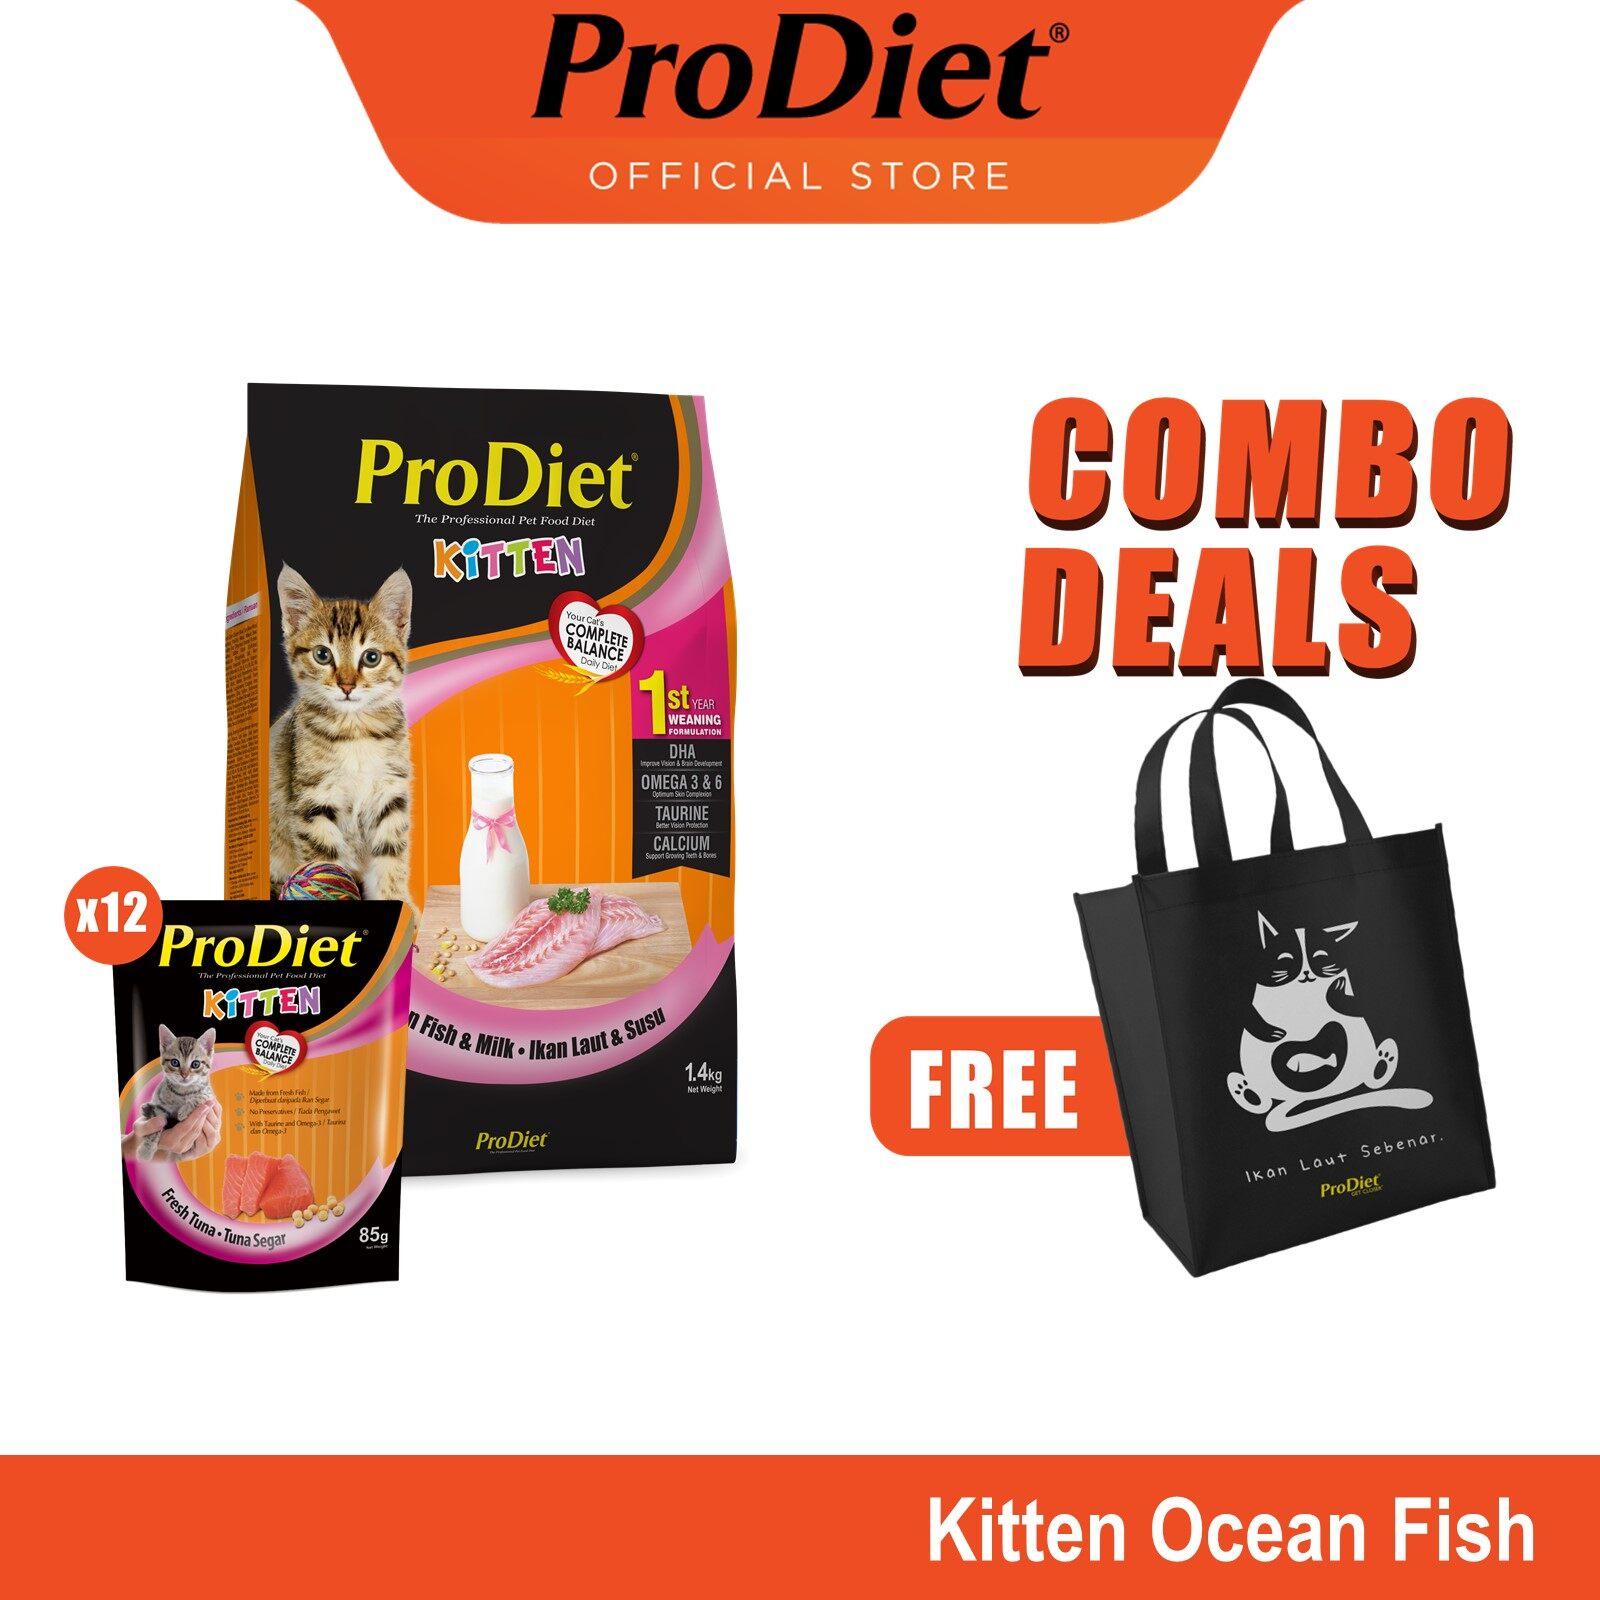 Combo Deals: ProDiet1.4KG Kitten Milky Ocean Fish Dry Food, ProDiet 85G Kitten Fresh Tuna Wet Cat Food X 12 Packs [makanan kucing],  FREE: Woven Bag